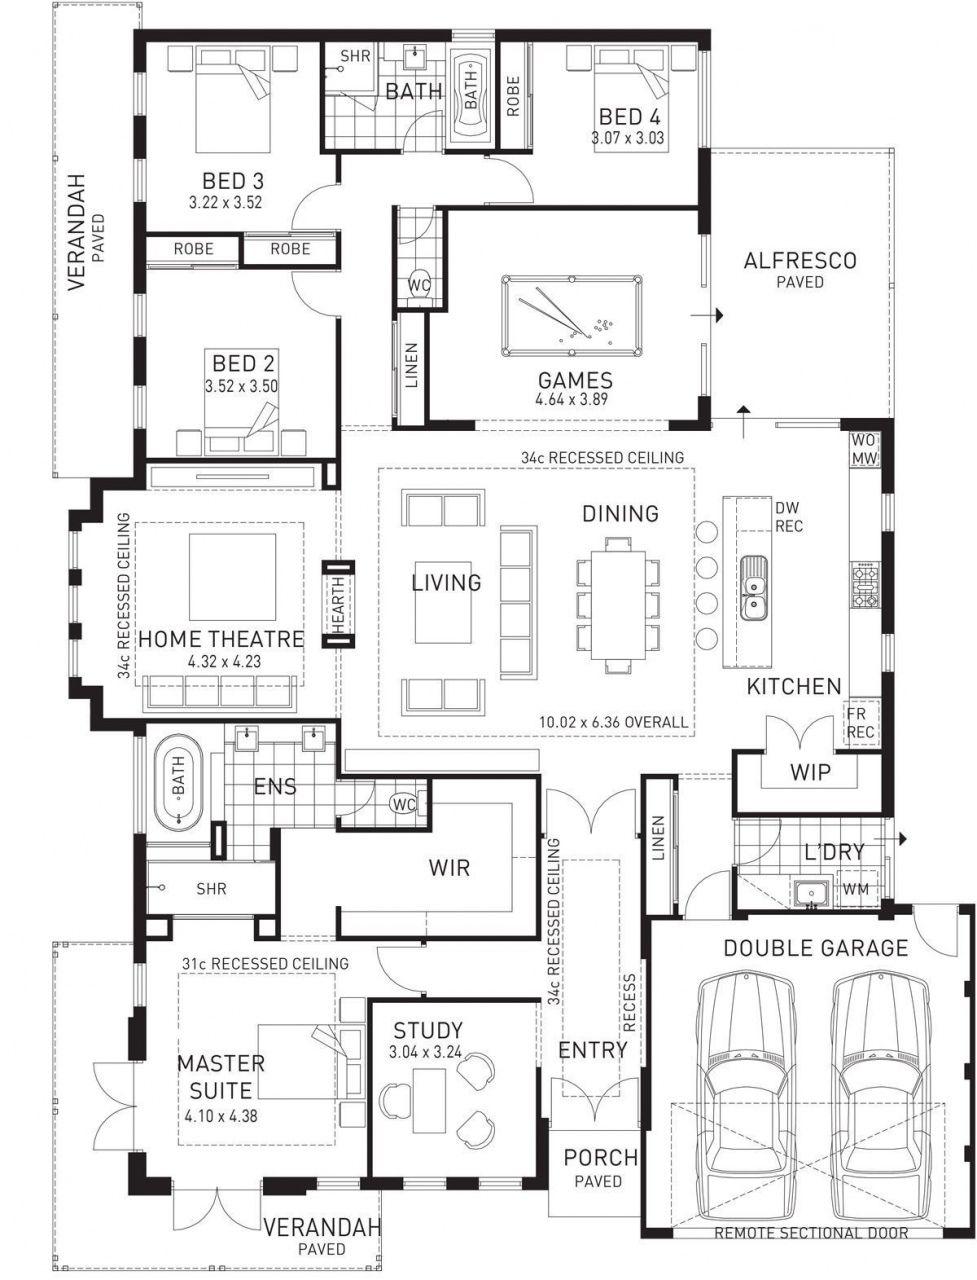 99 Make Your Own House Design 2019 Home Design Floor Plans Floor Plan Design House Blueprints